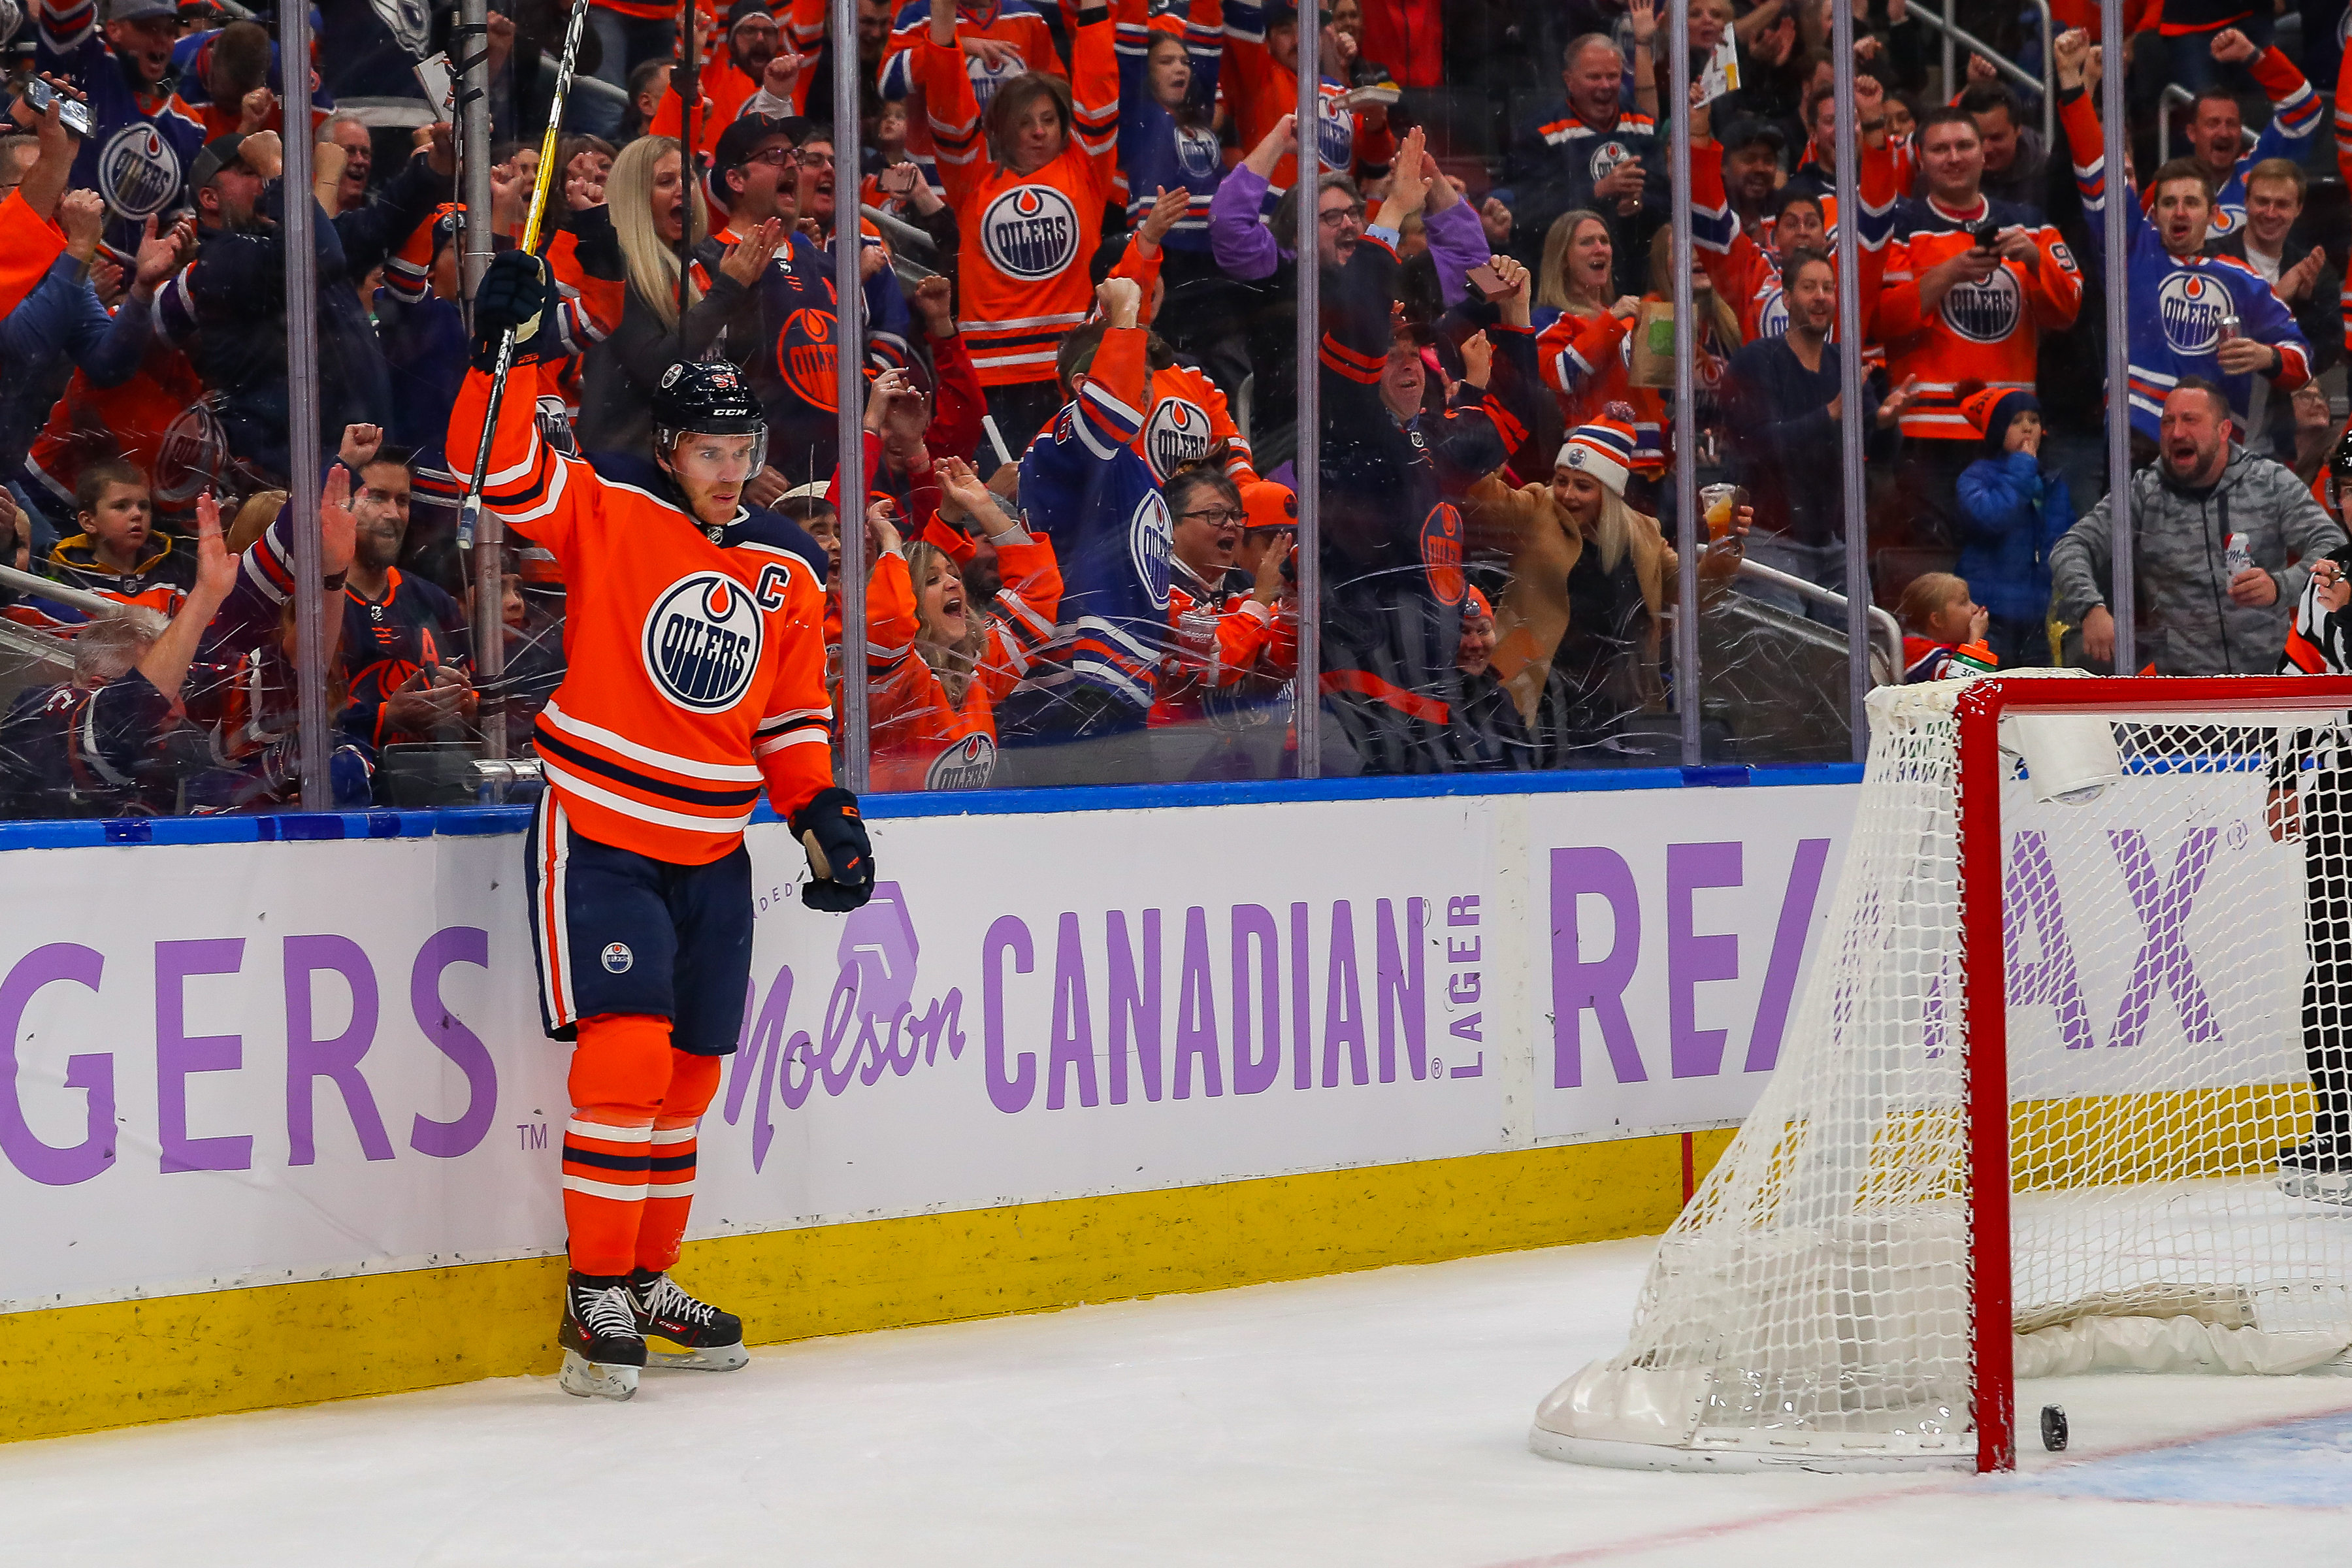 NHL: NOV 16 Stars at Oilers